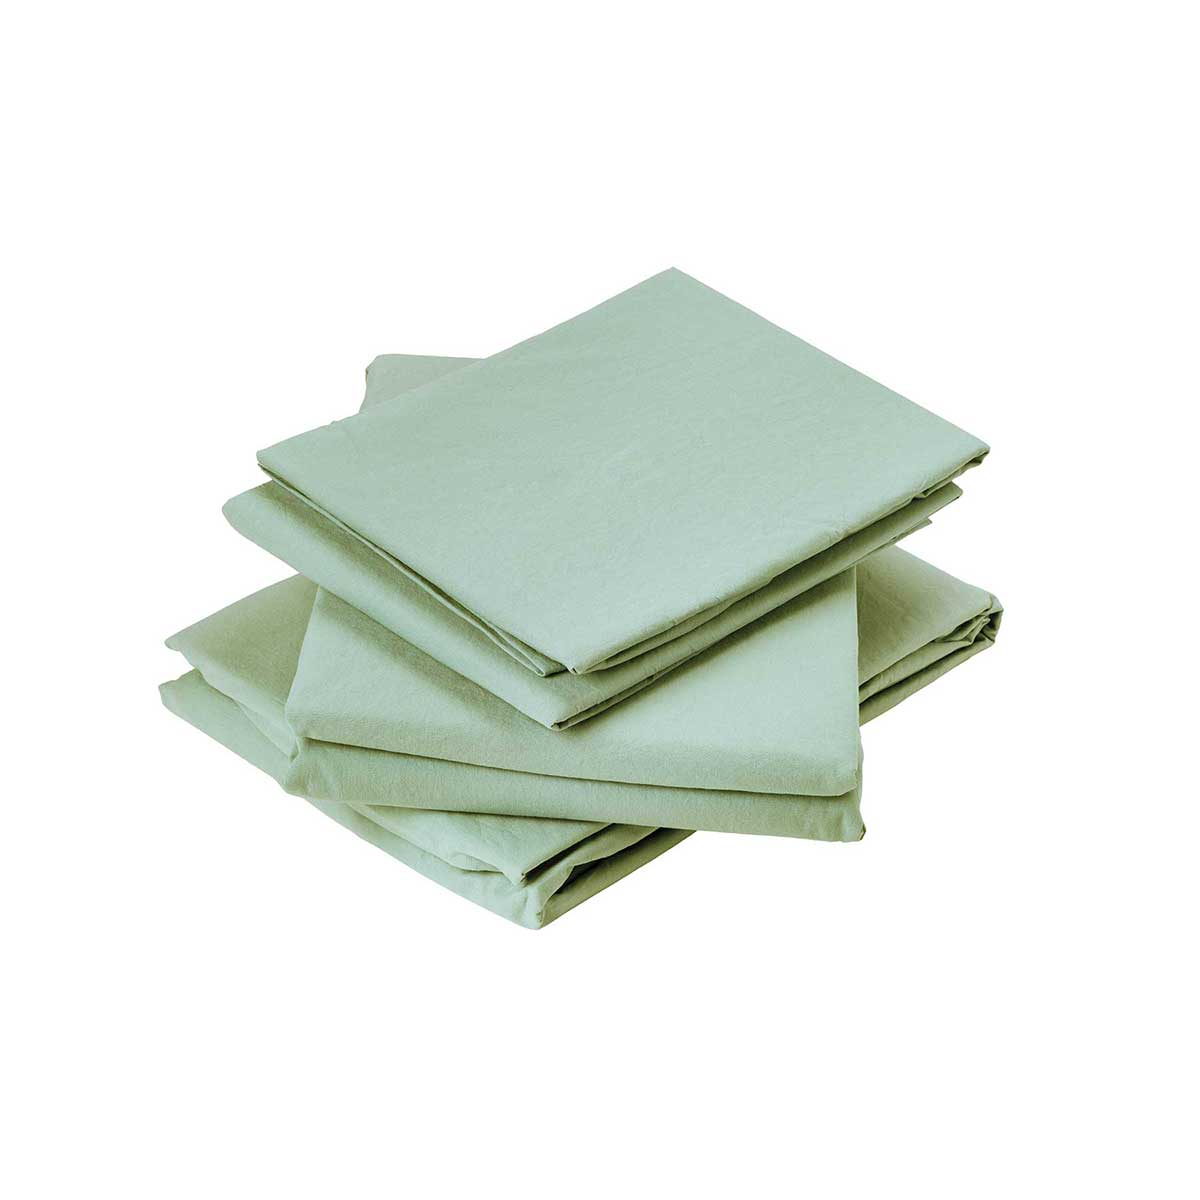 Drap plat en coton lavé coton aqua 290x180